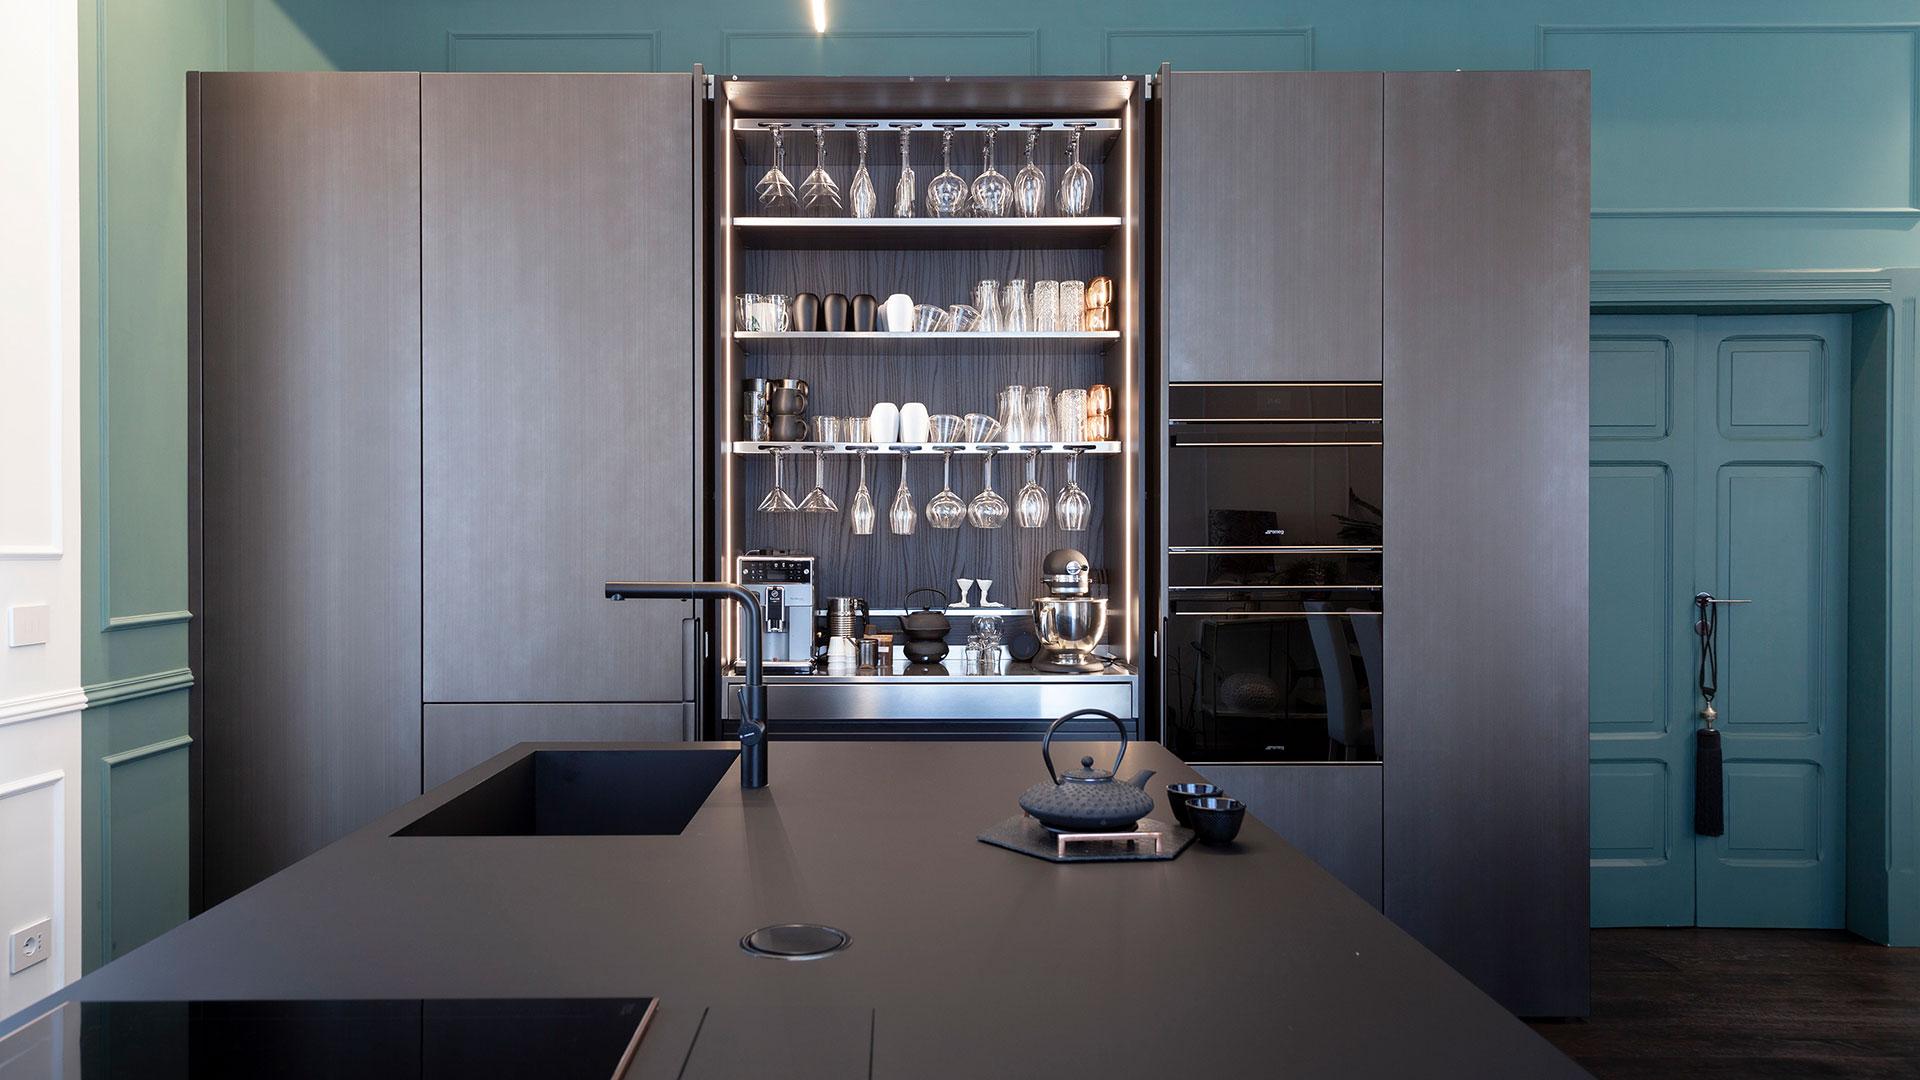 TM Italia | Linear kitchen with an island in Fenix